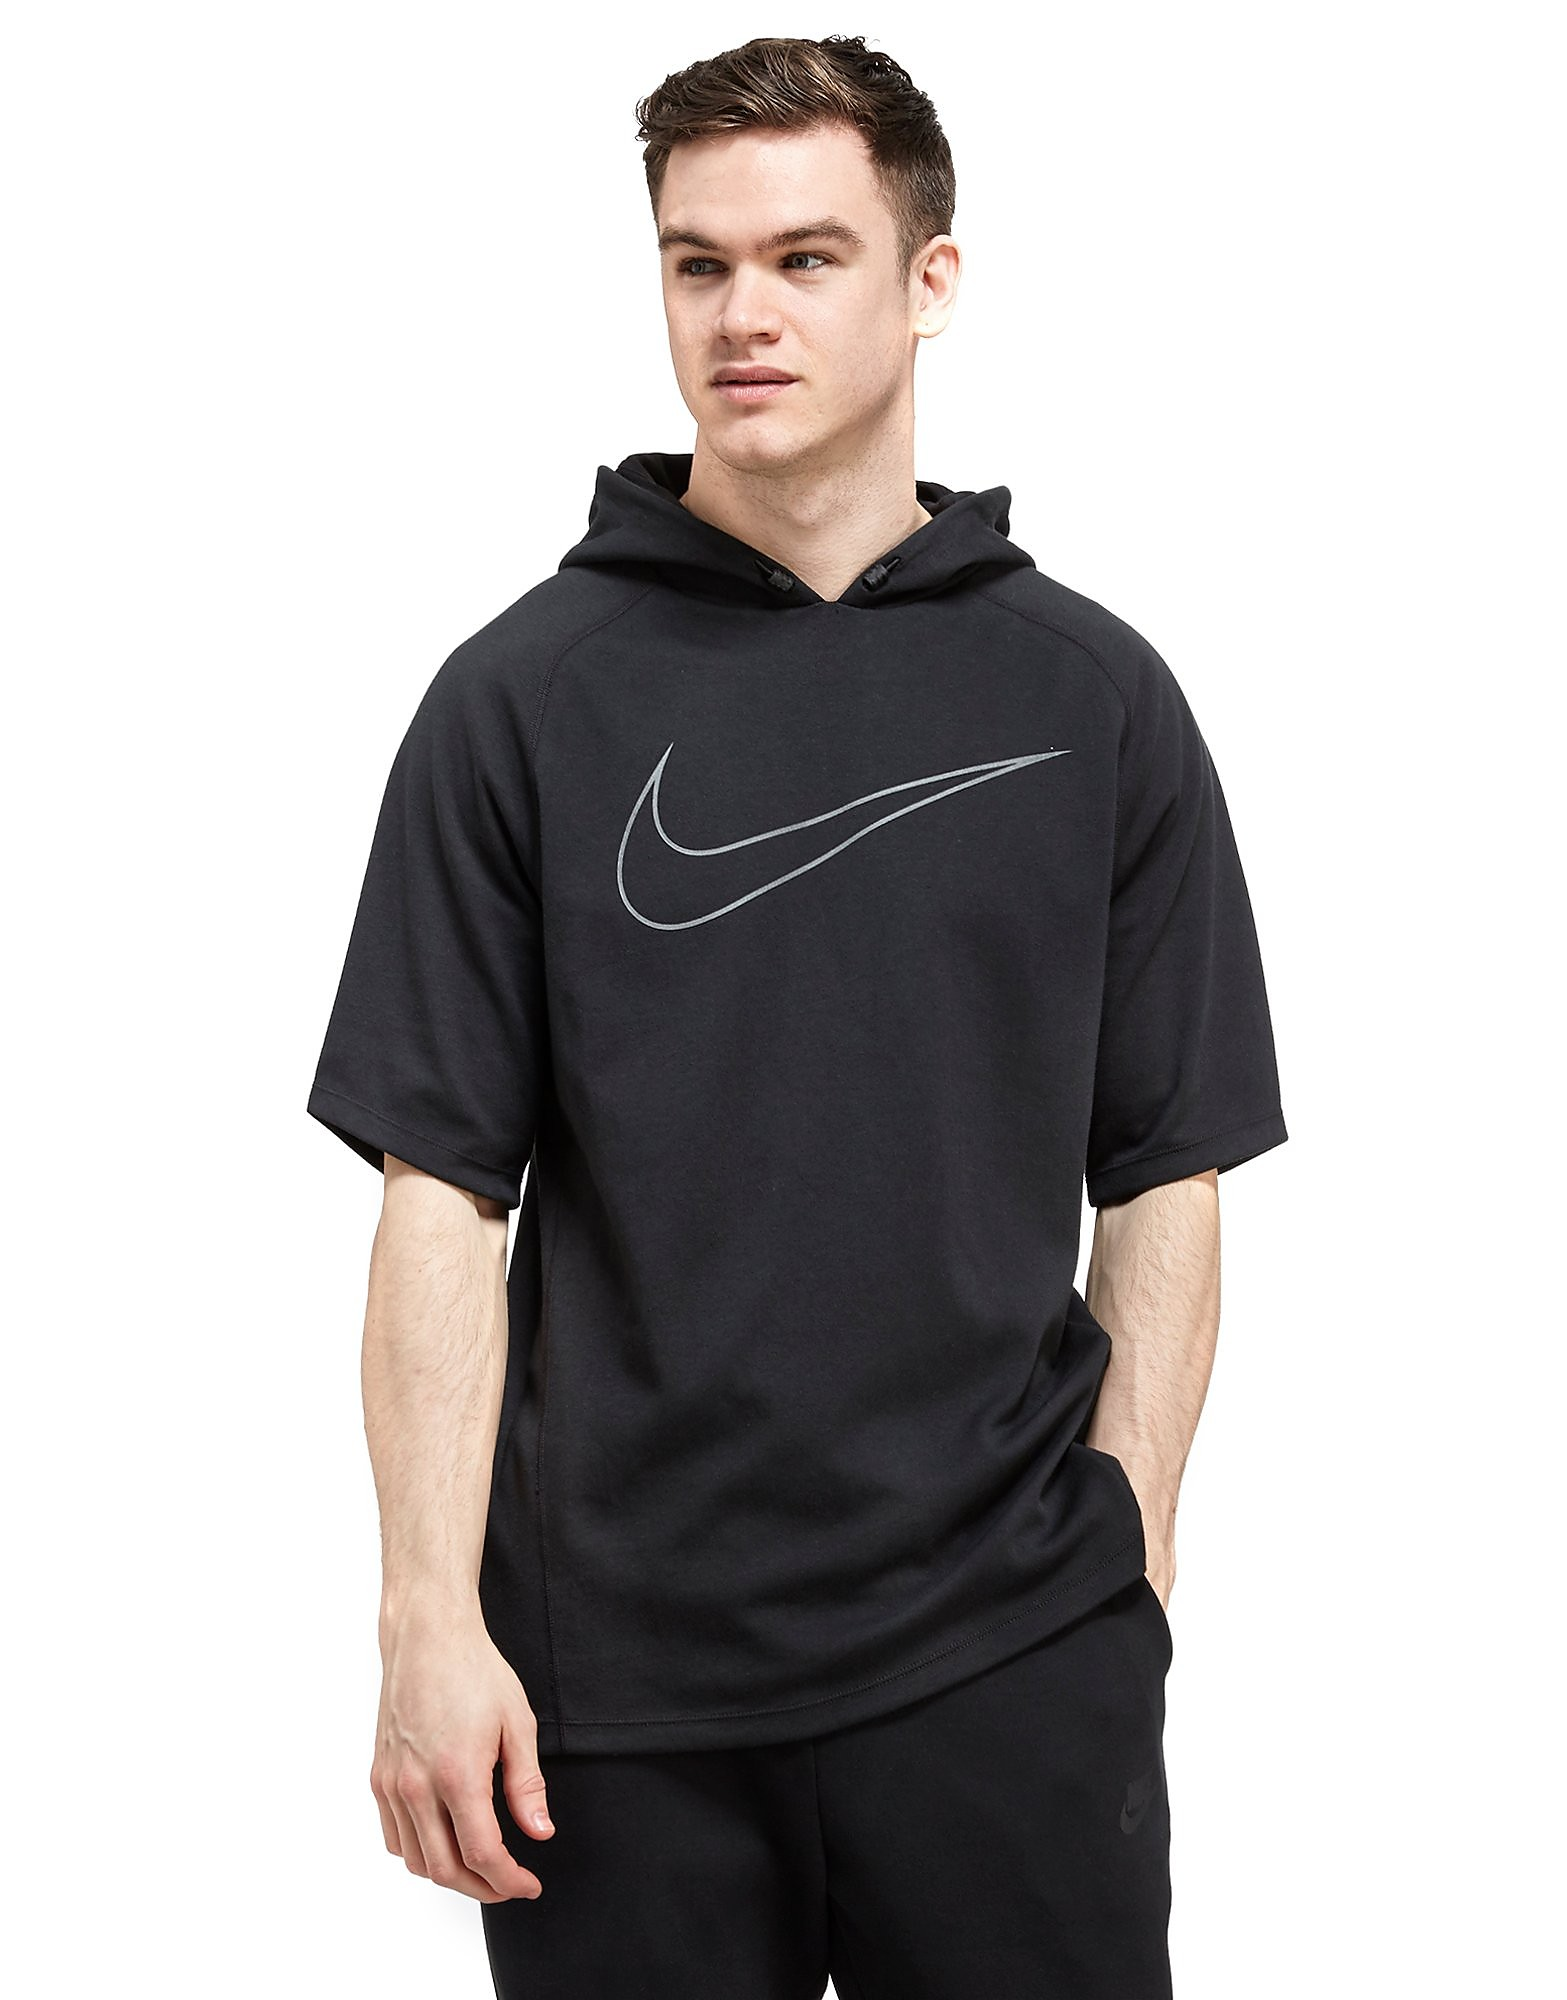 Nike City Short Sleeve Hoody